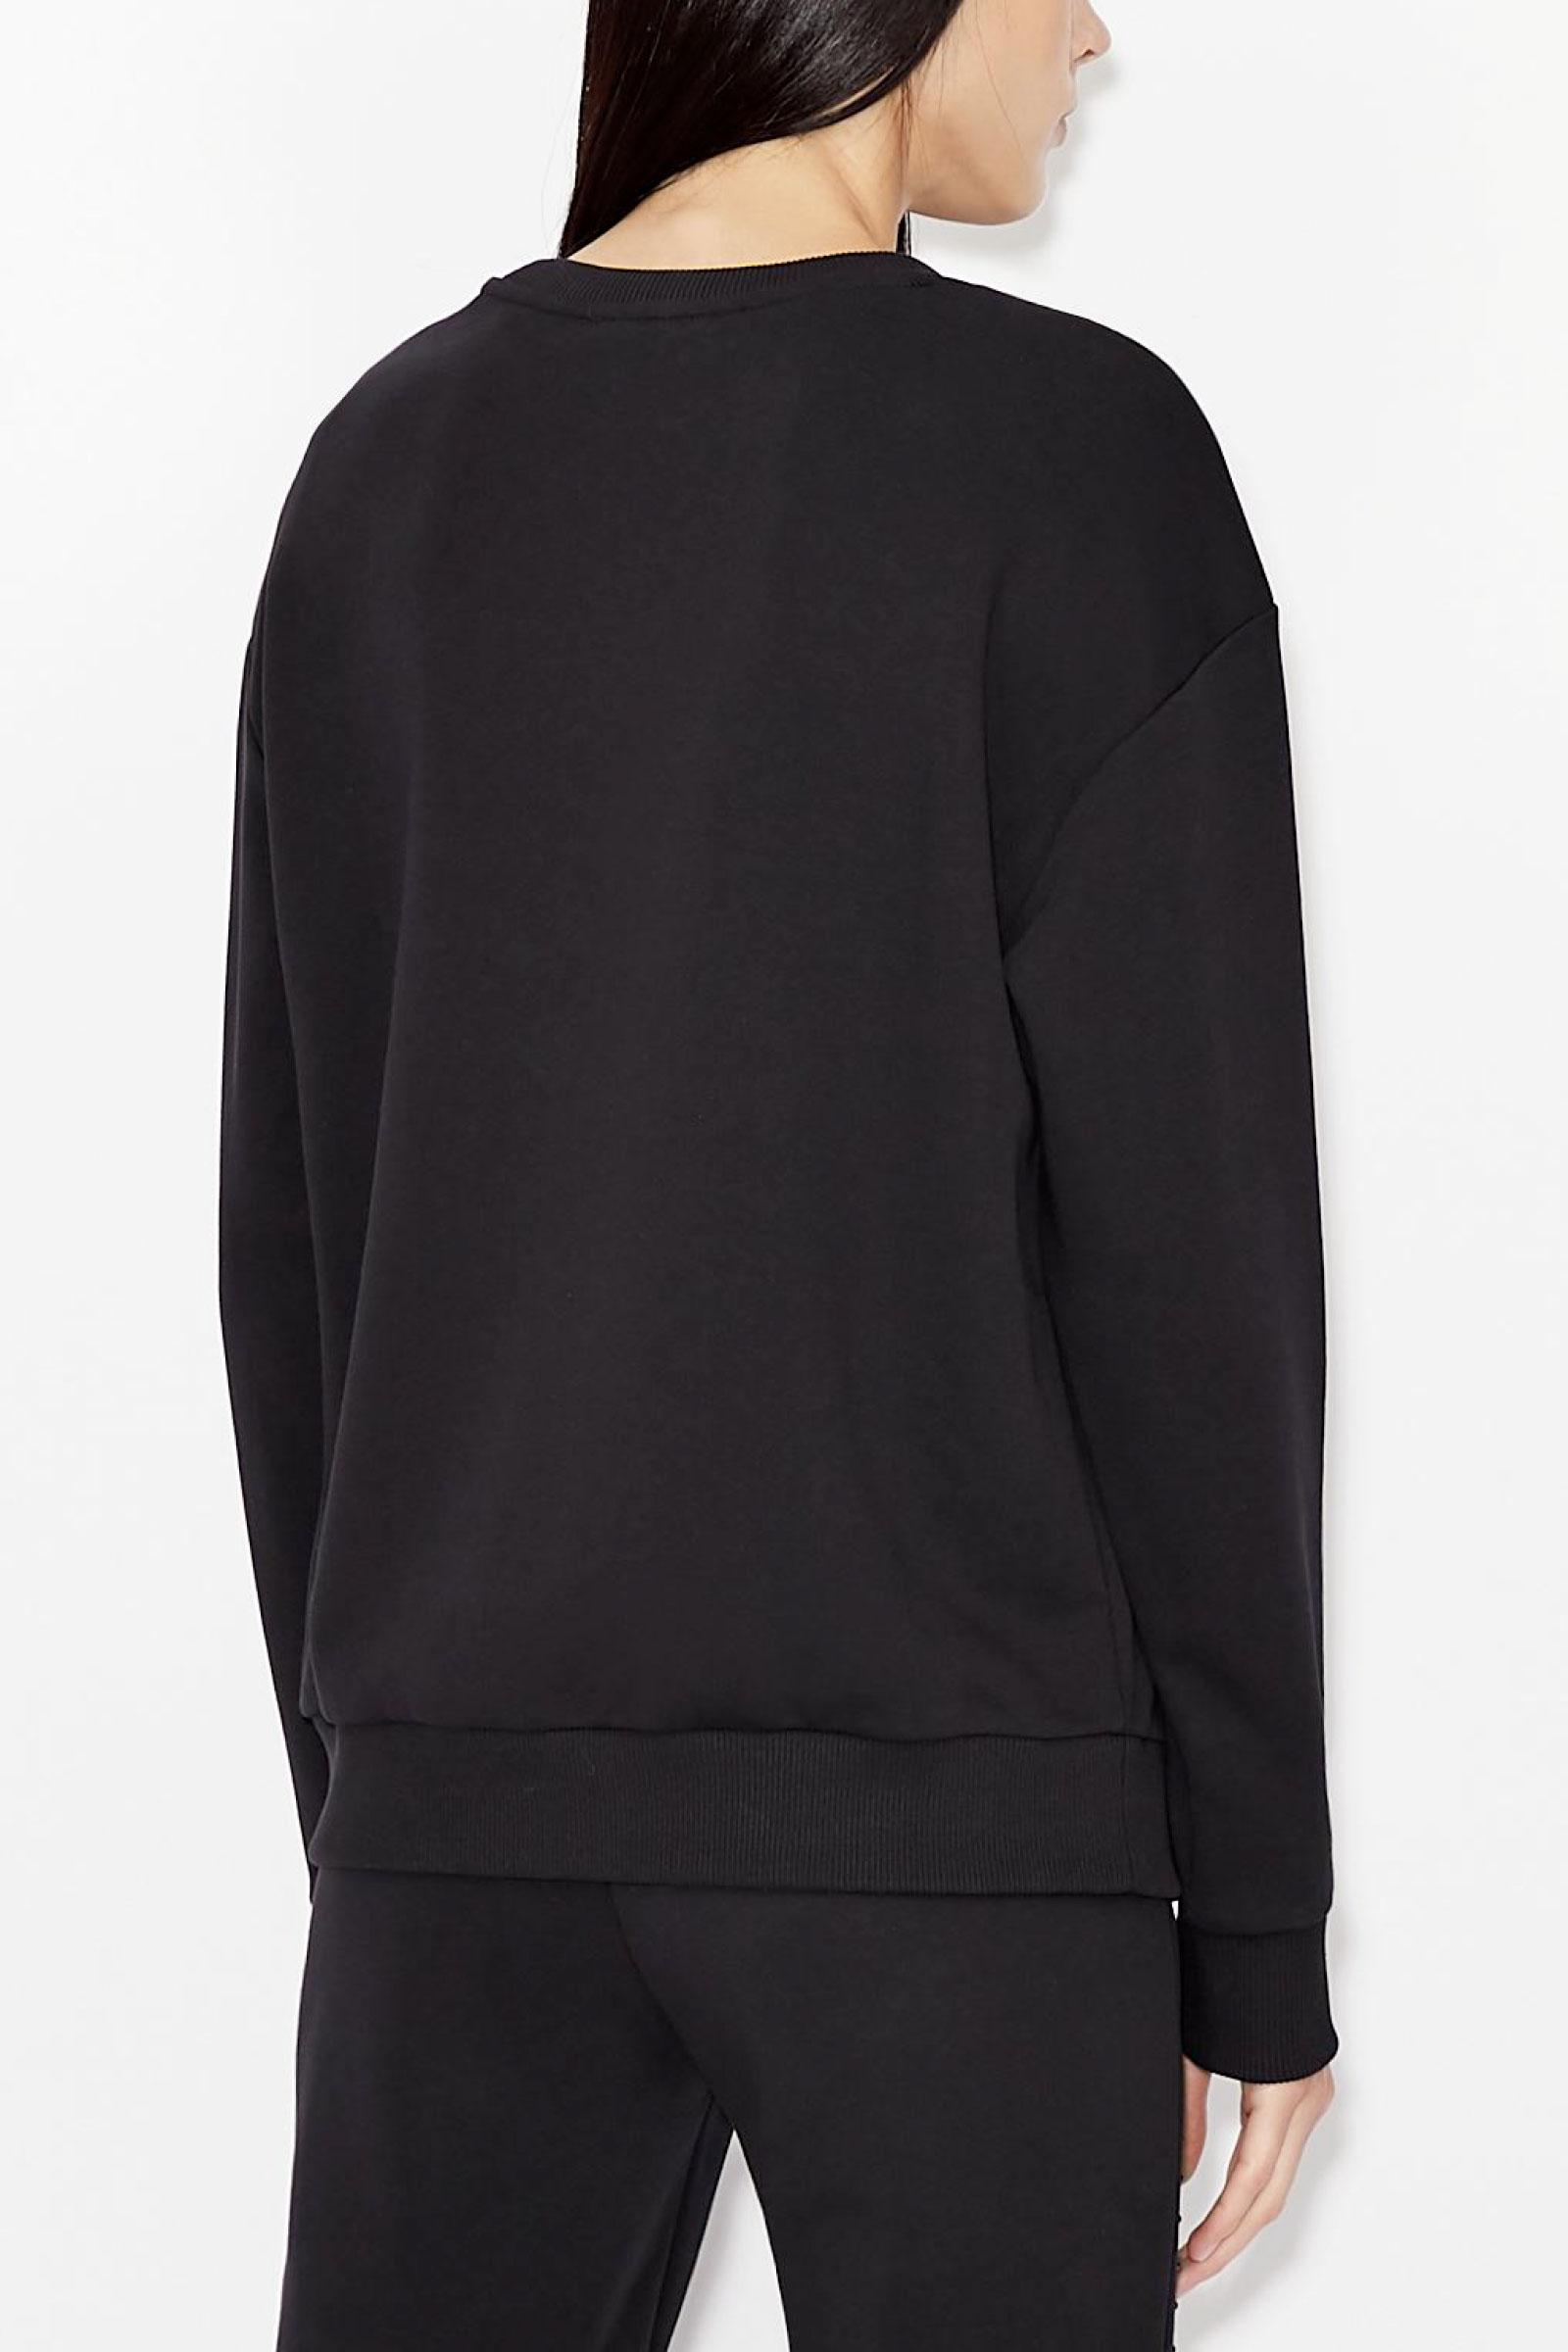 ARMANI EXCHANGE   Sweatshirt   6KYM96 YJ6PZ1200